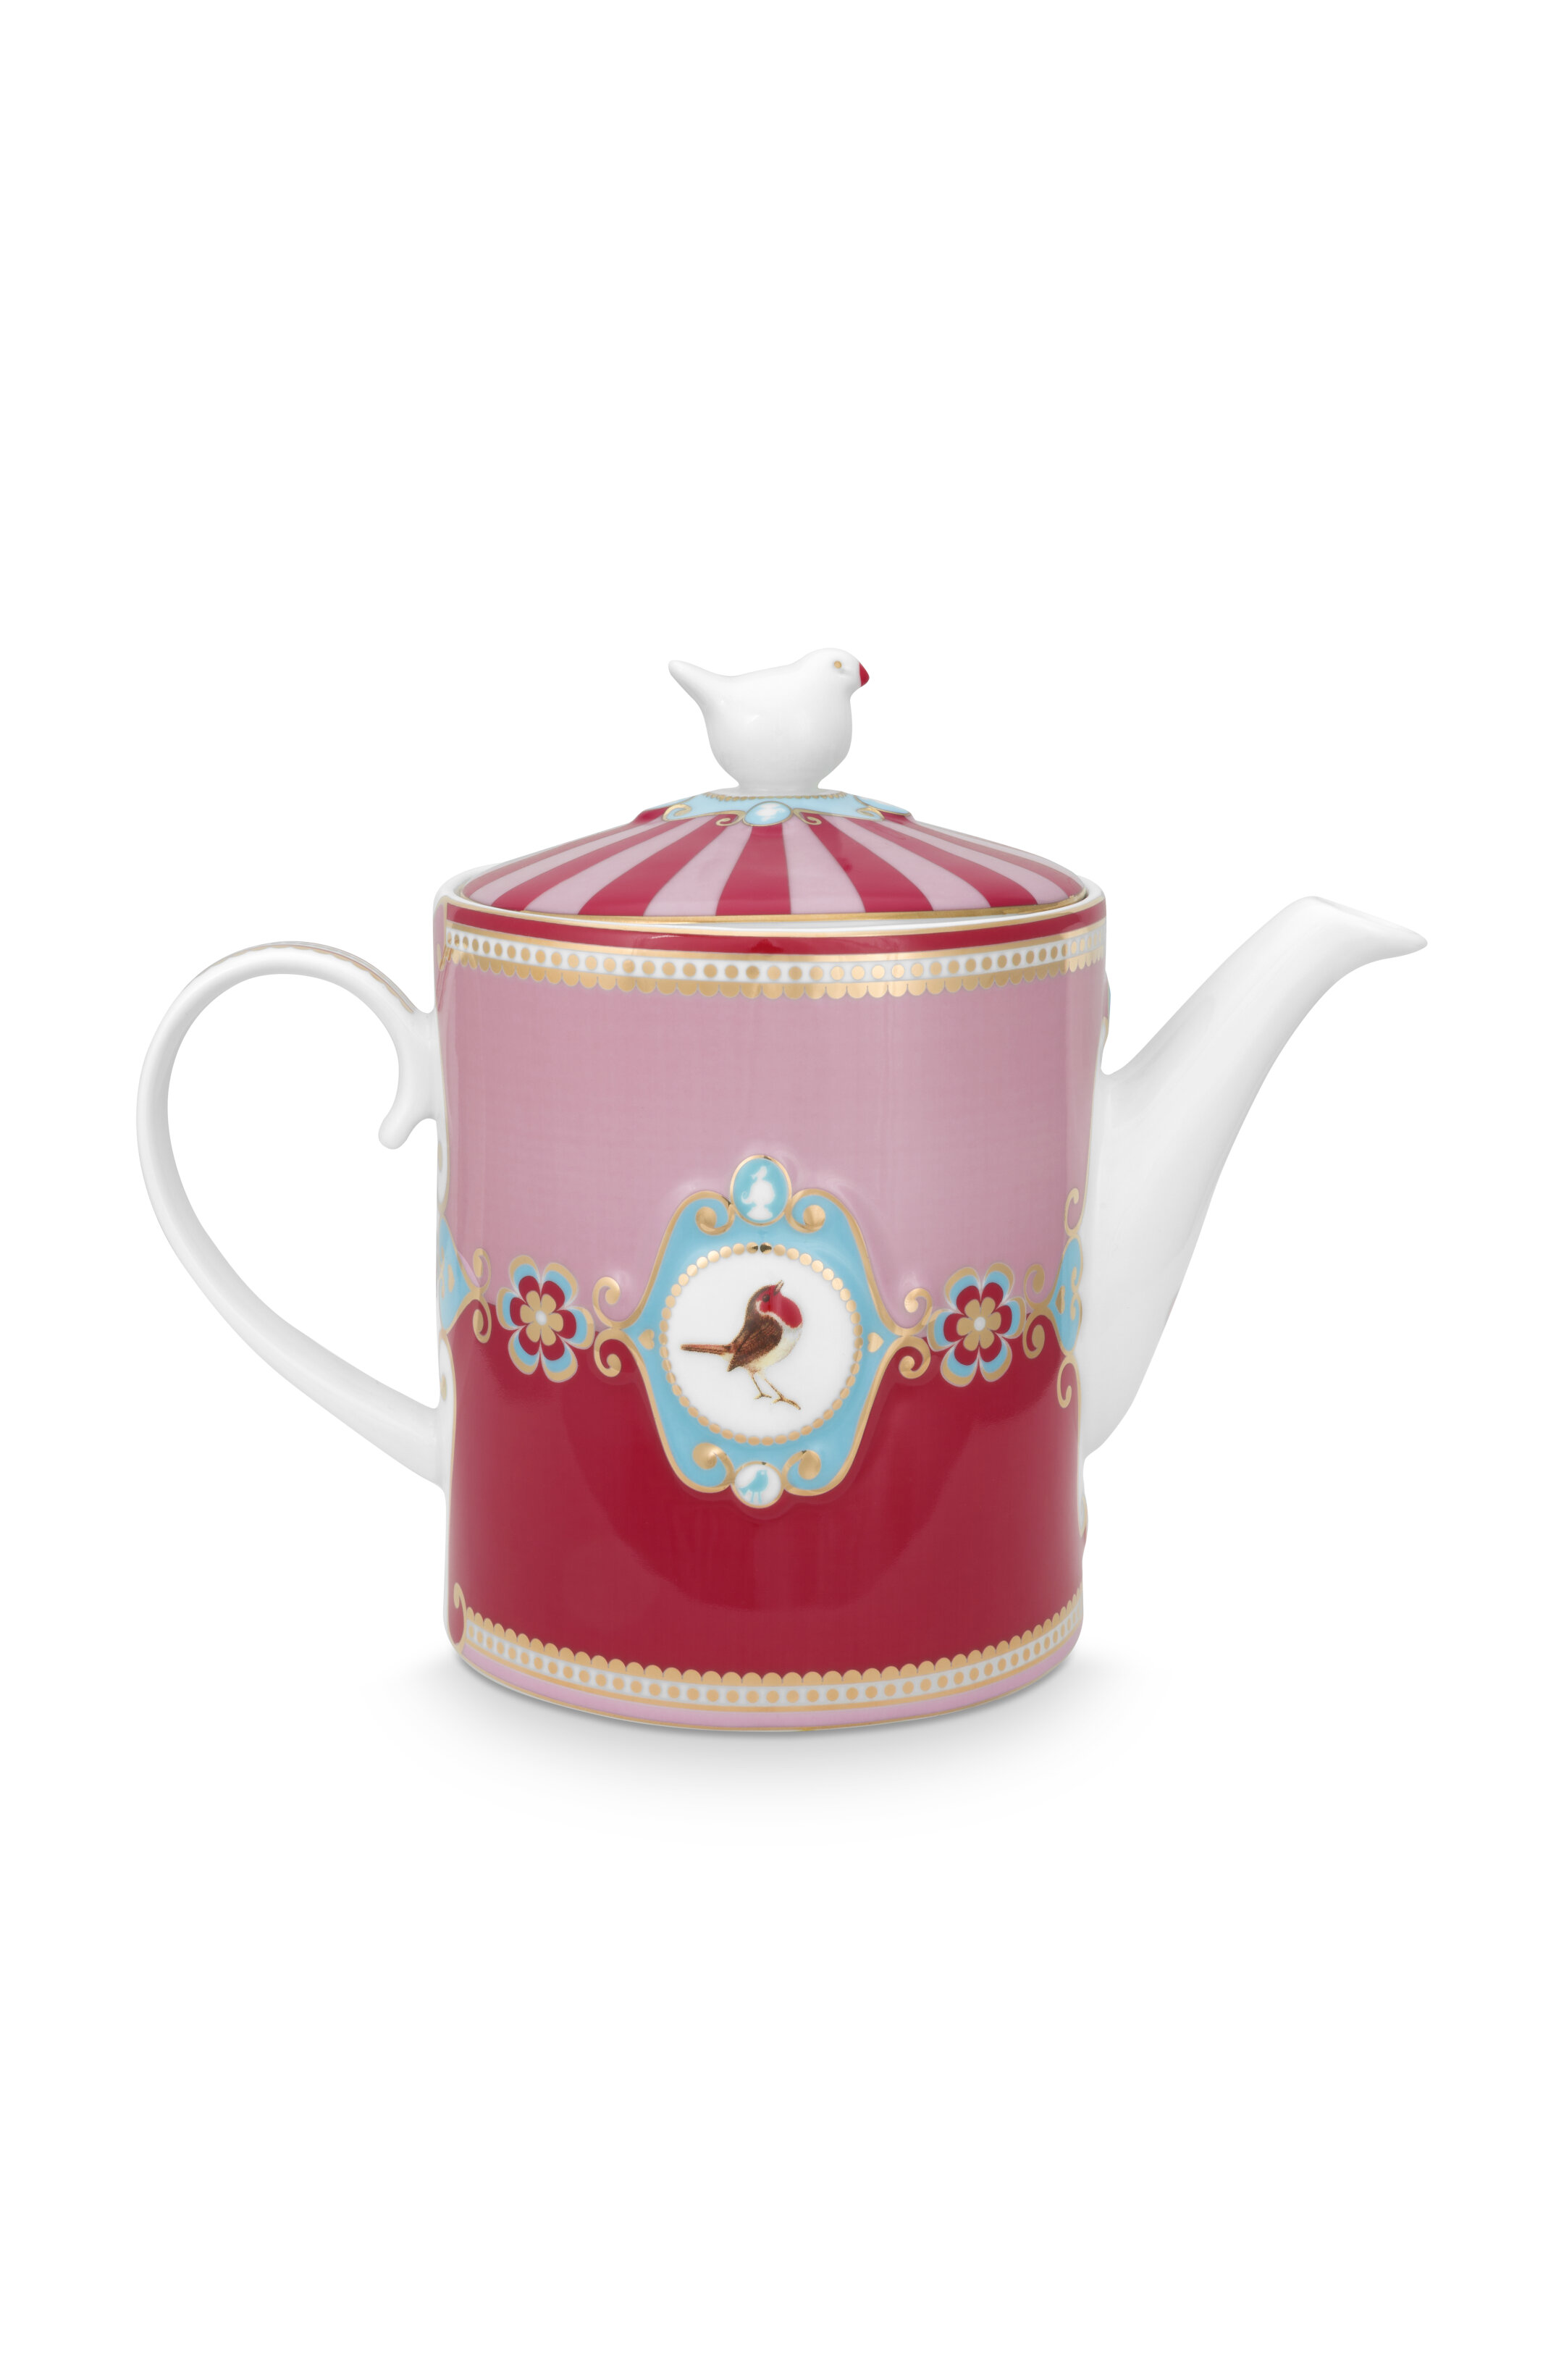 Pip Studio Love Birds Teekanne Medaillon Red-Pink